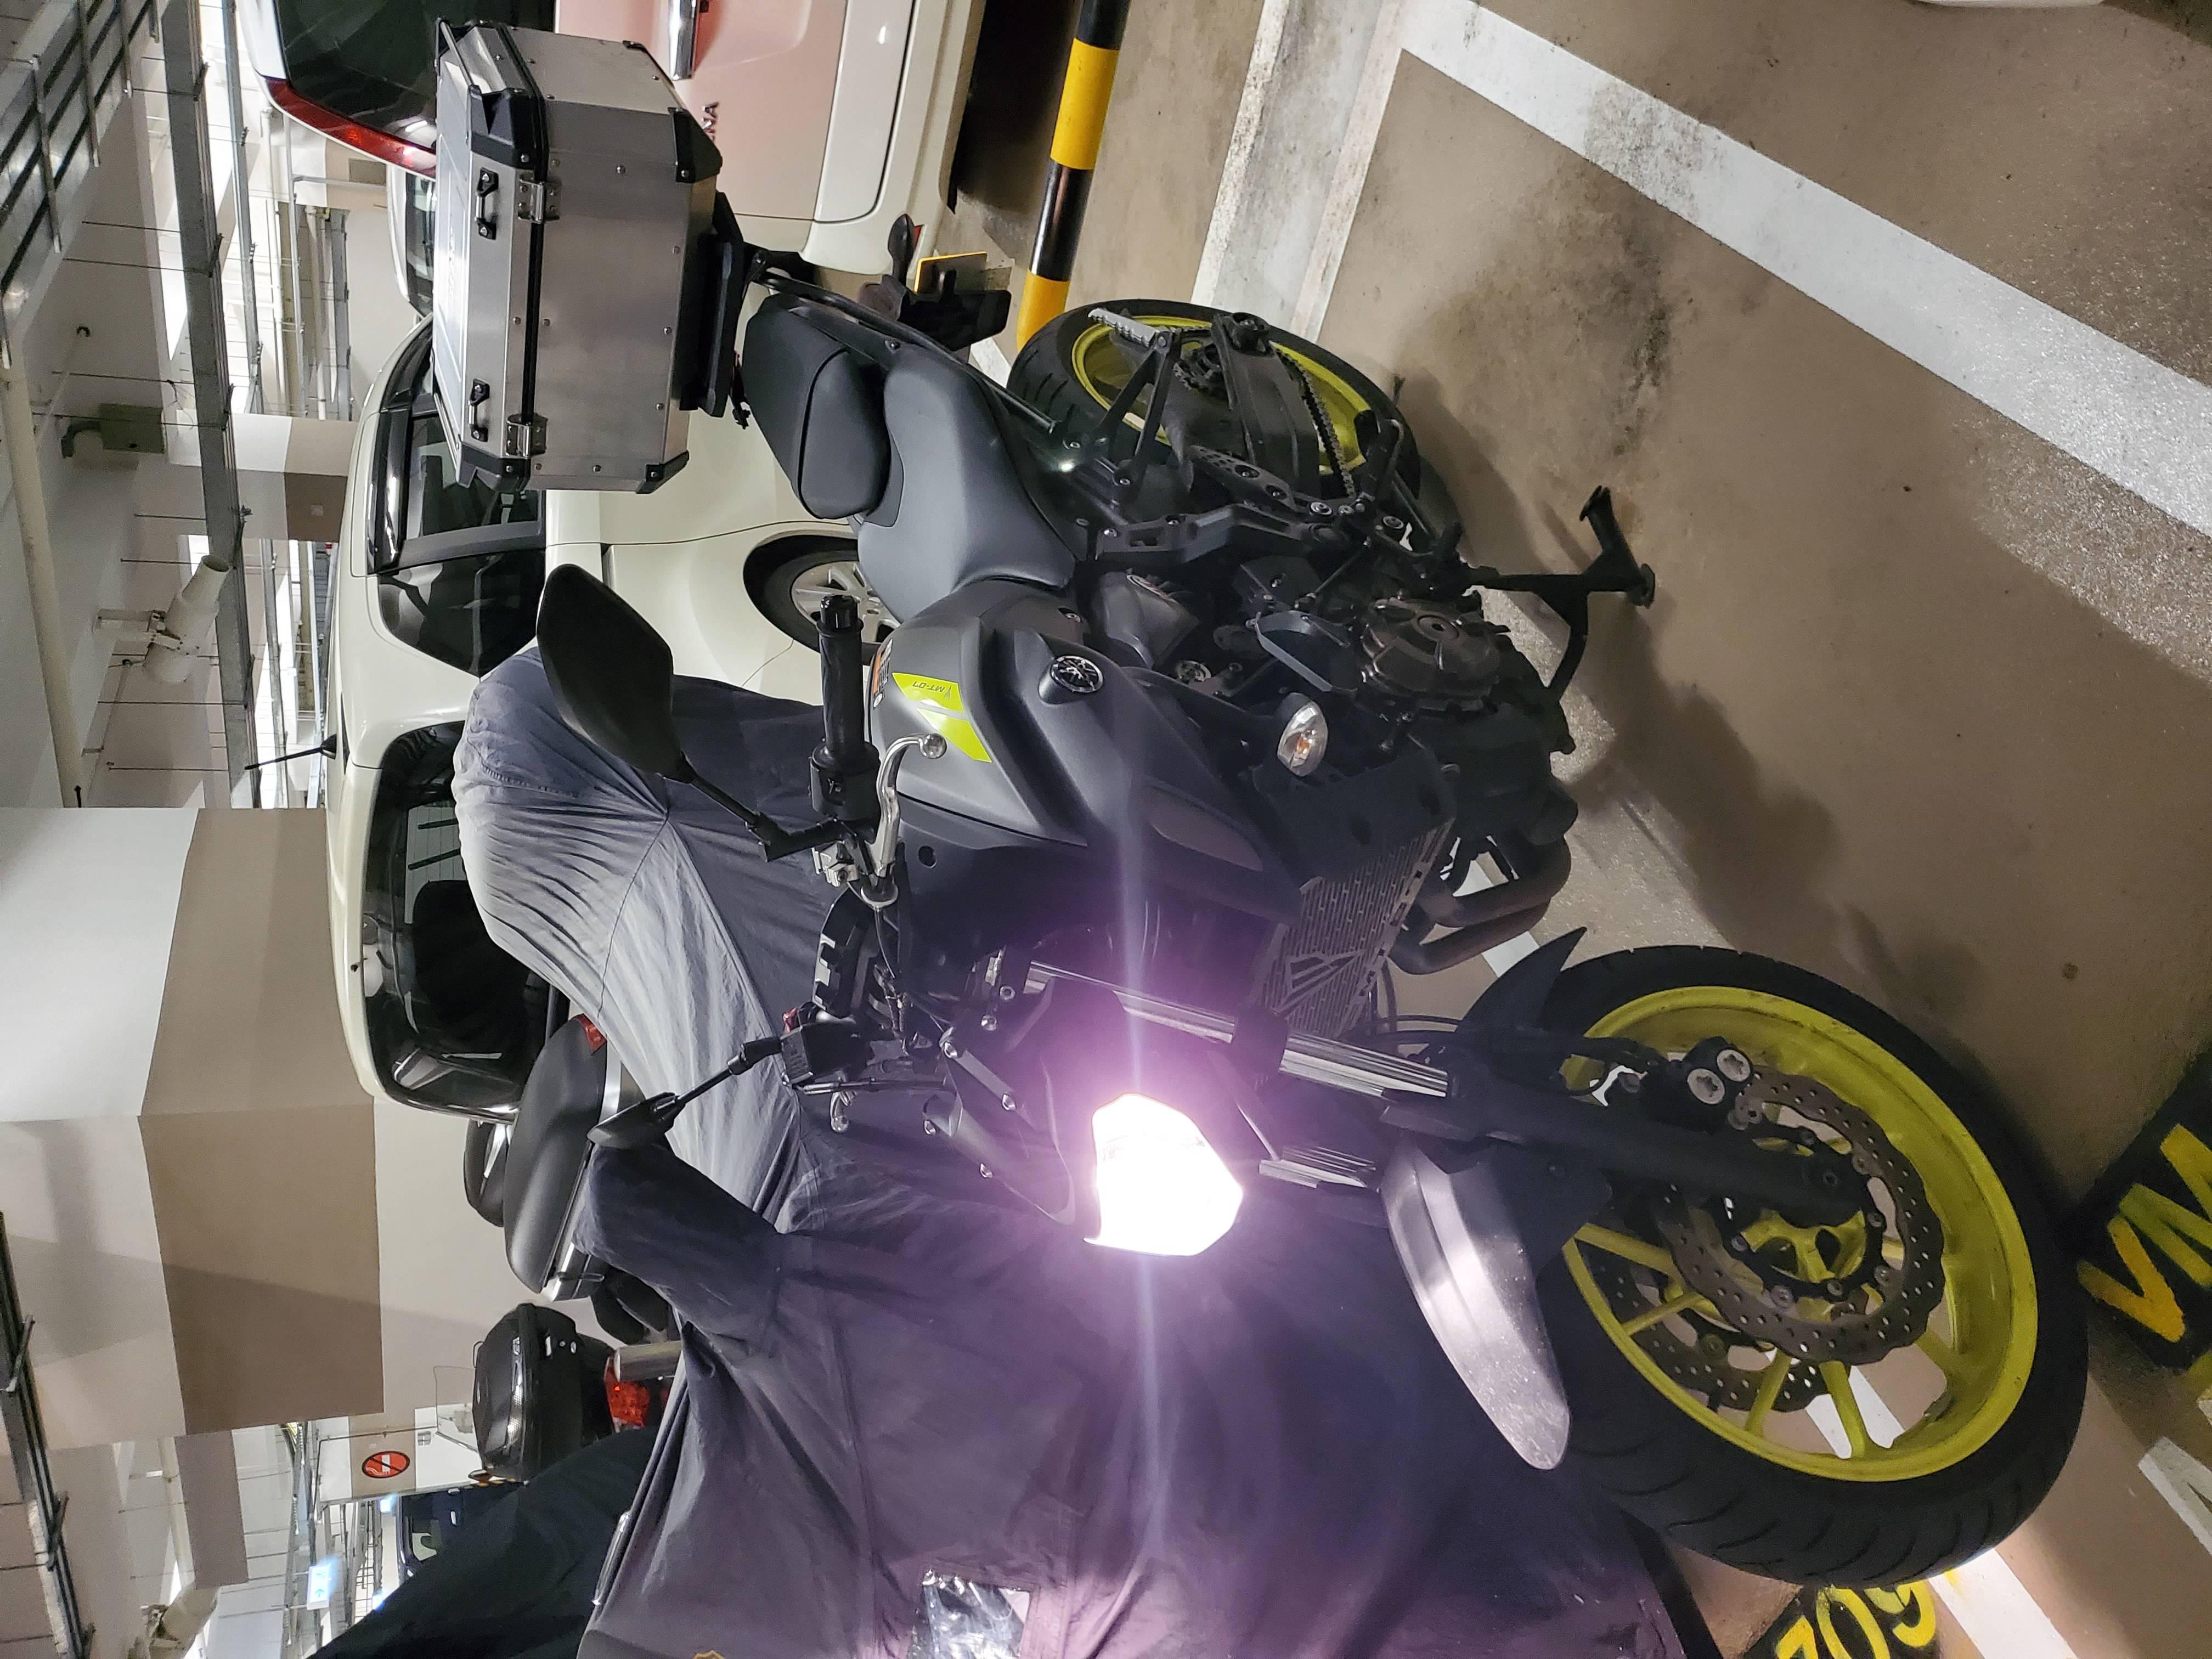 【個人自售】 YAMAHA MT-07(FZ-07) 二手車 2018年 - 「Webike摩托車市」